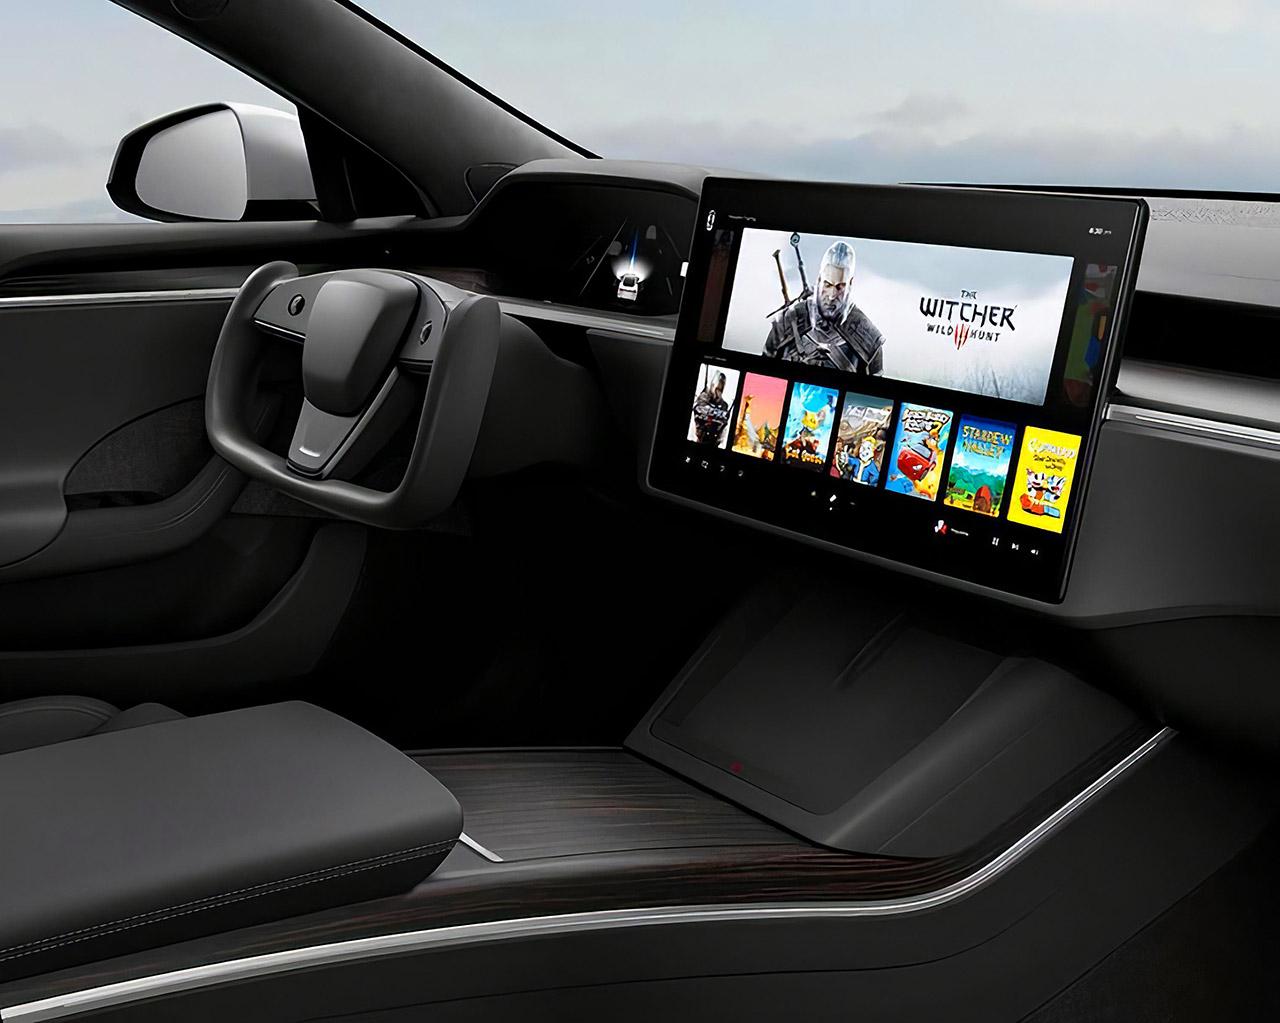 AMD Ryzen RDNA 2 Tesla Model S Model X Infotainment System